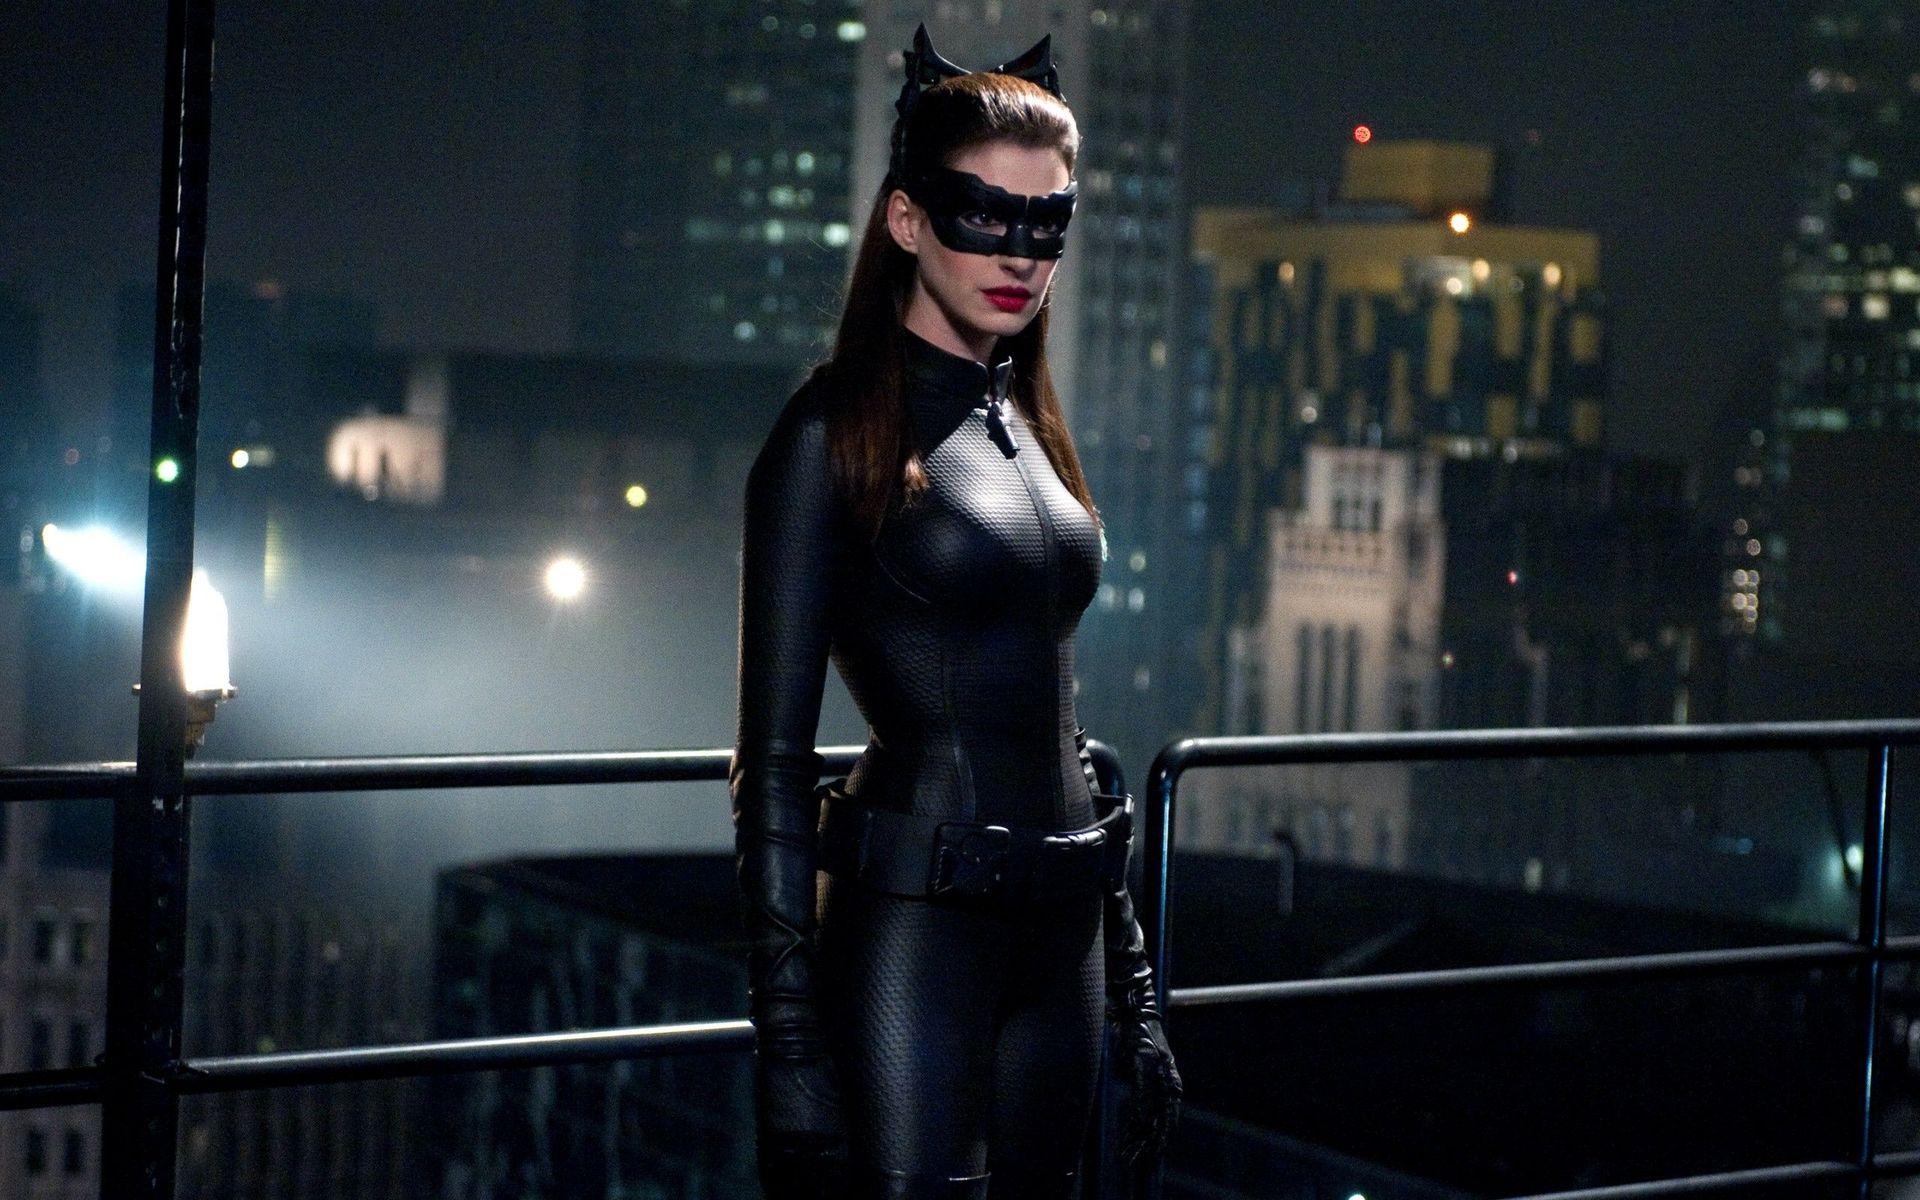 catwoman-the-dark-knight-rises-movie-hd-wallpaper-1920x1200-4729